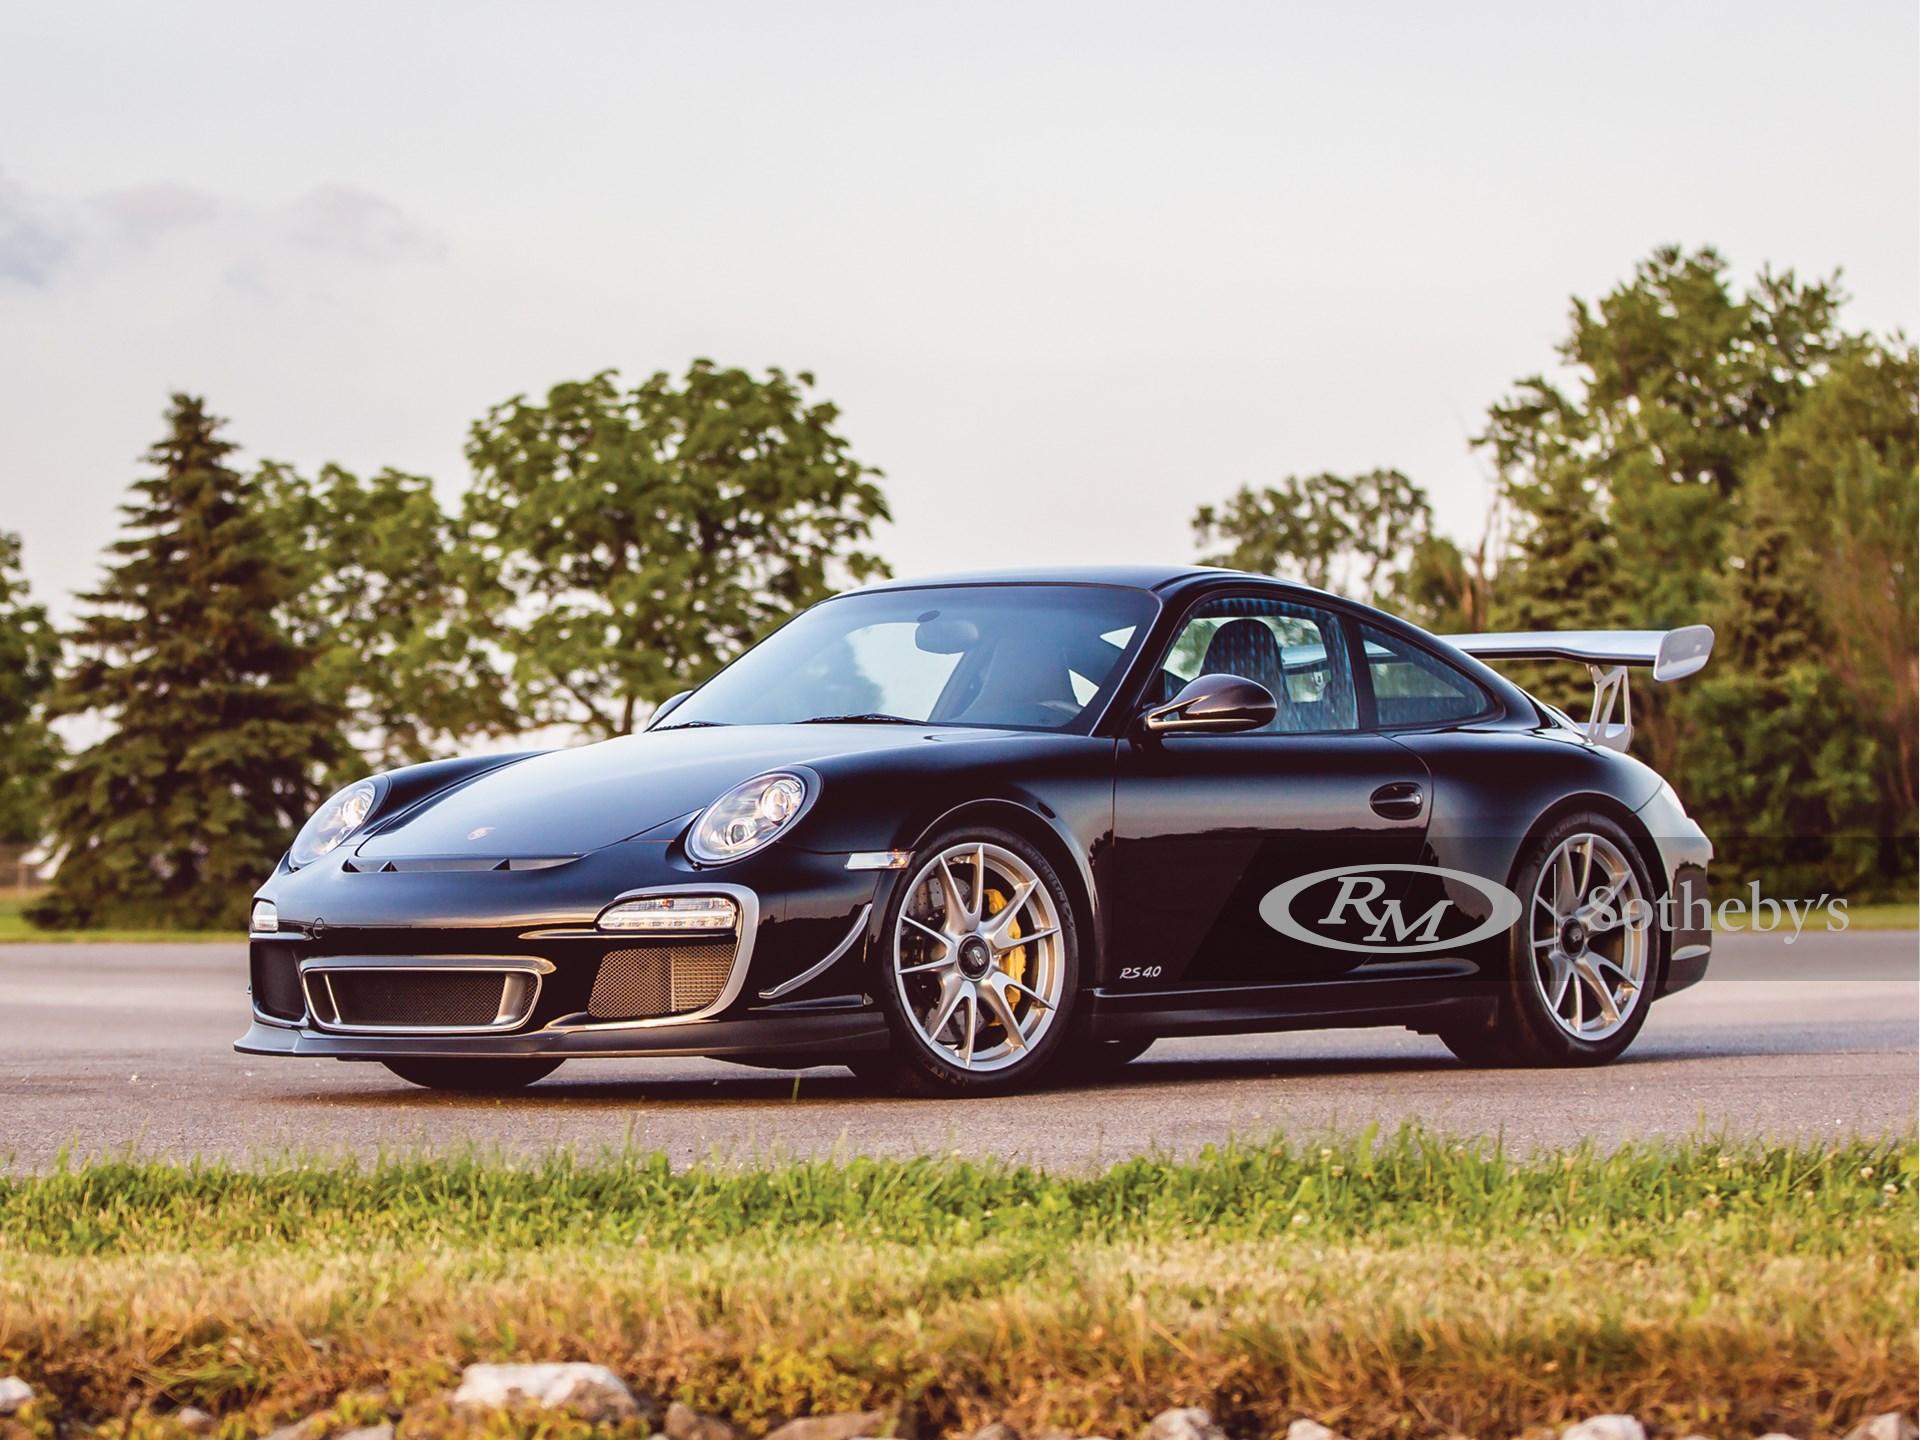 2011 Porsche 911 Gt3 Rs 4 0 Monterey 2019 Rm Sotheby S